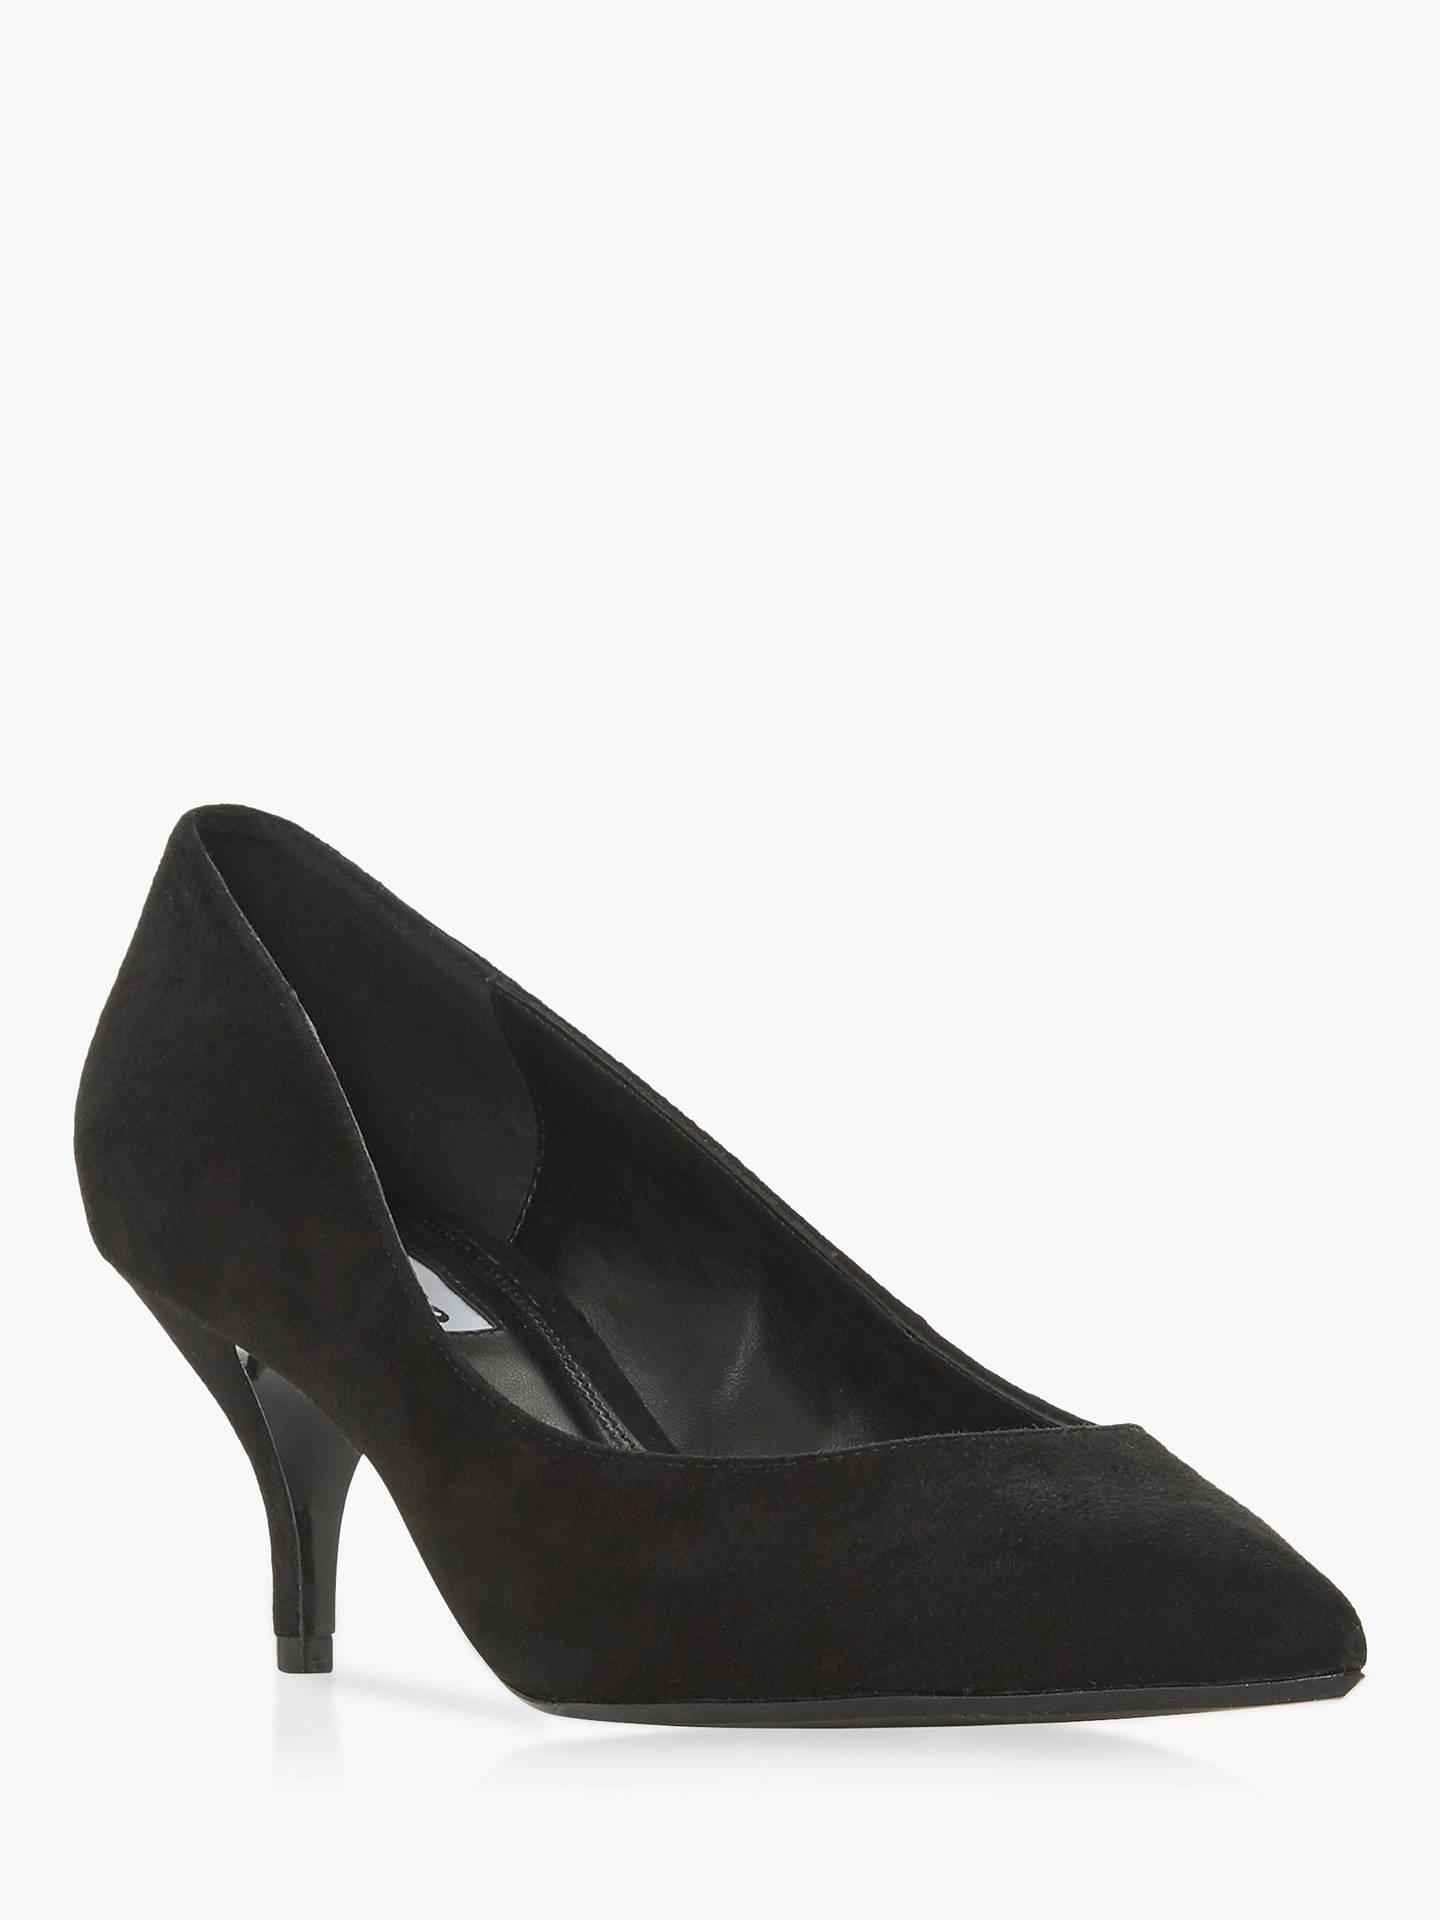 73d9bb062b2a Dune Alma T Kitten Heel Court Shoes at John Lewis   Partners